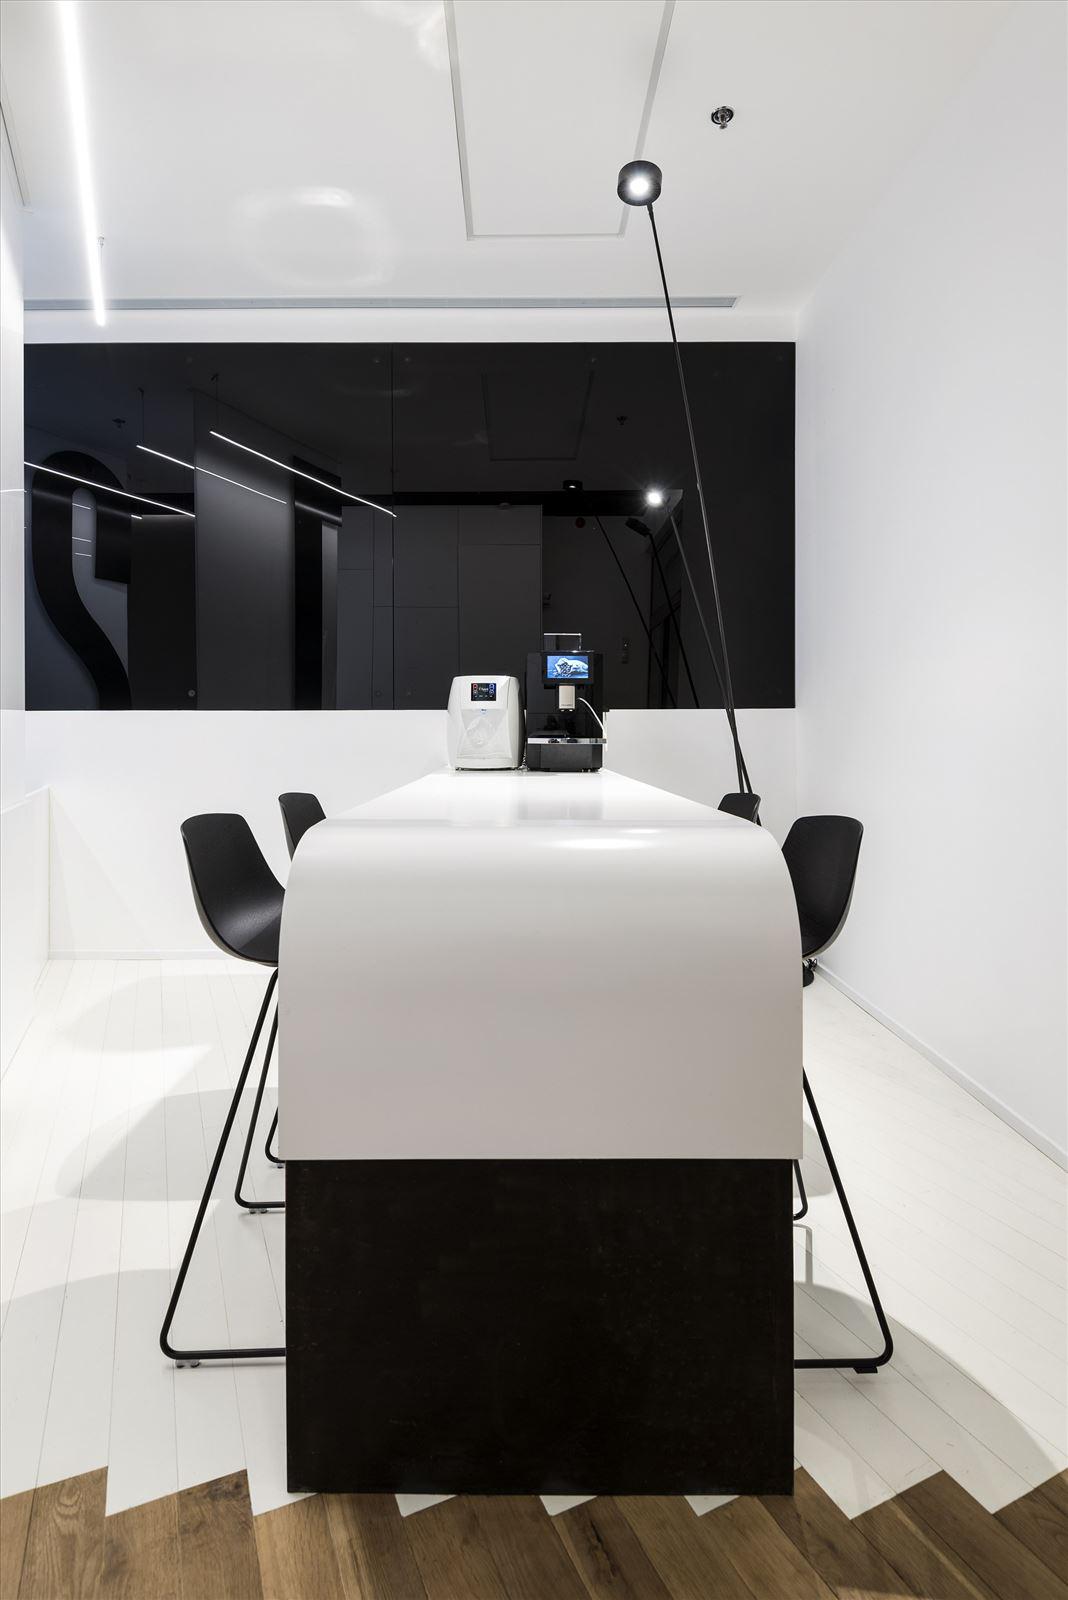 Office lighting project תאורה אדריכלית על ידי קמחי תאורה